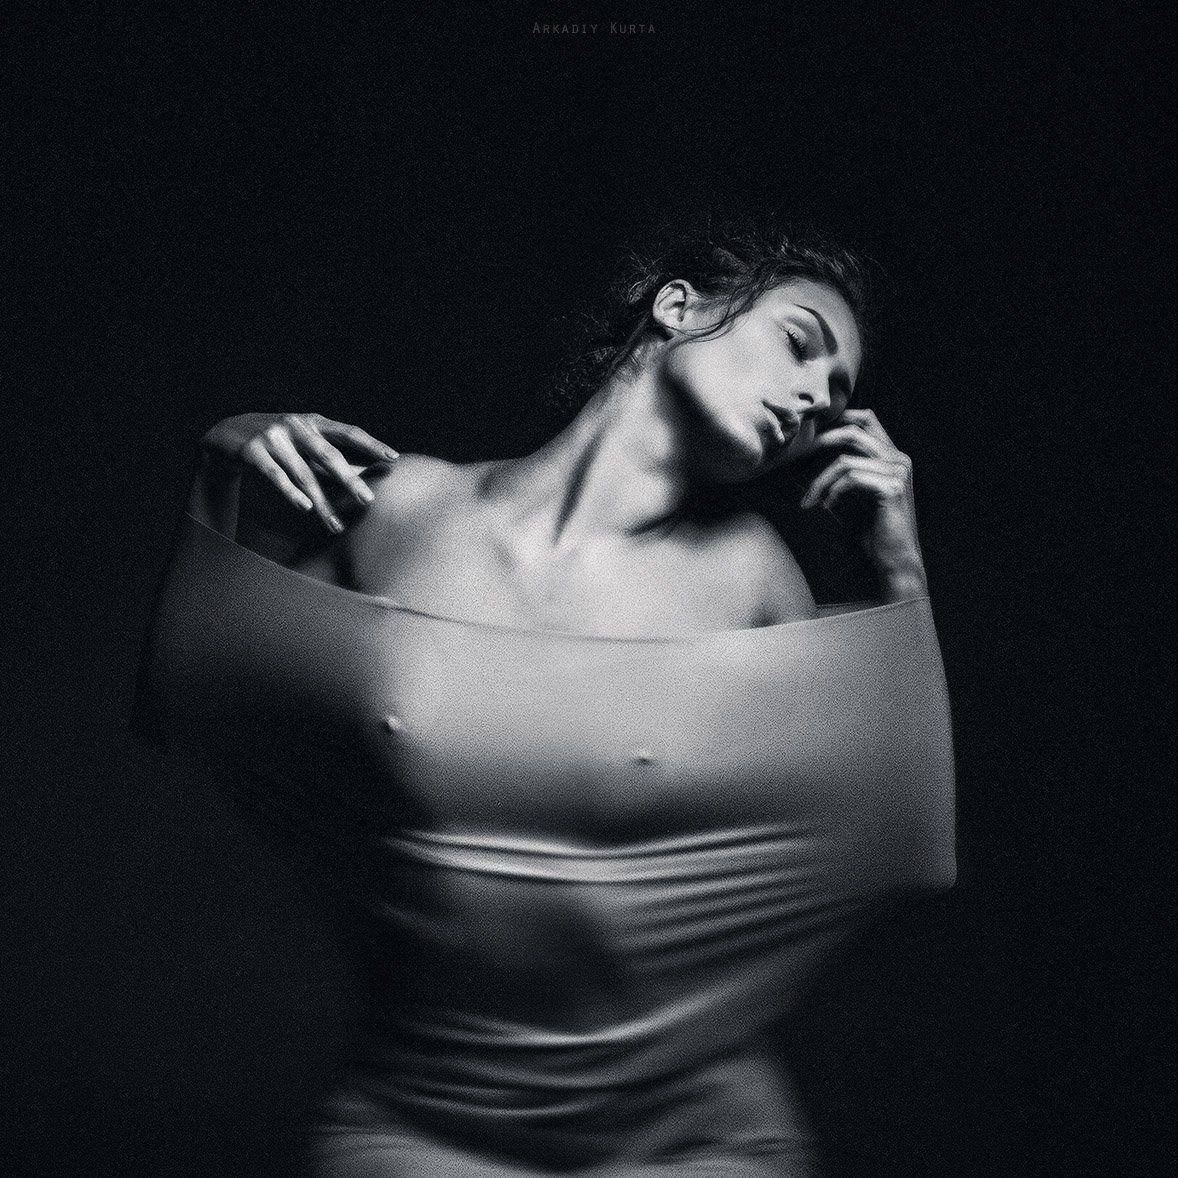 Arkadiy kurta, Art photo, Artistic, Beauty, Body, Look, Nude art, Модель, Портрет девушки, Светографика, Студия, Аркадий Курта